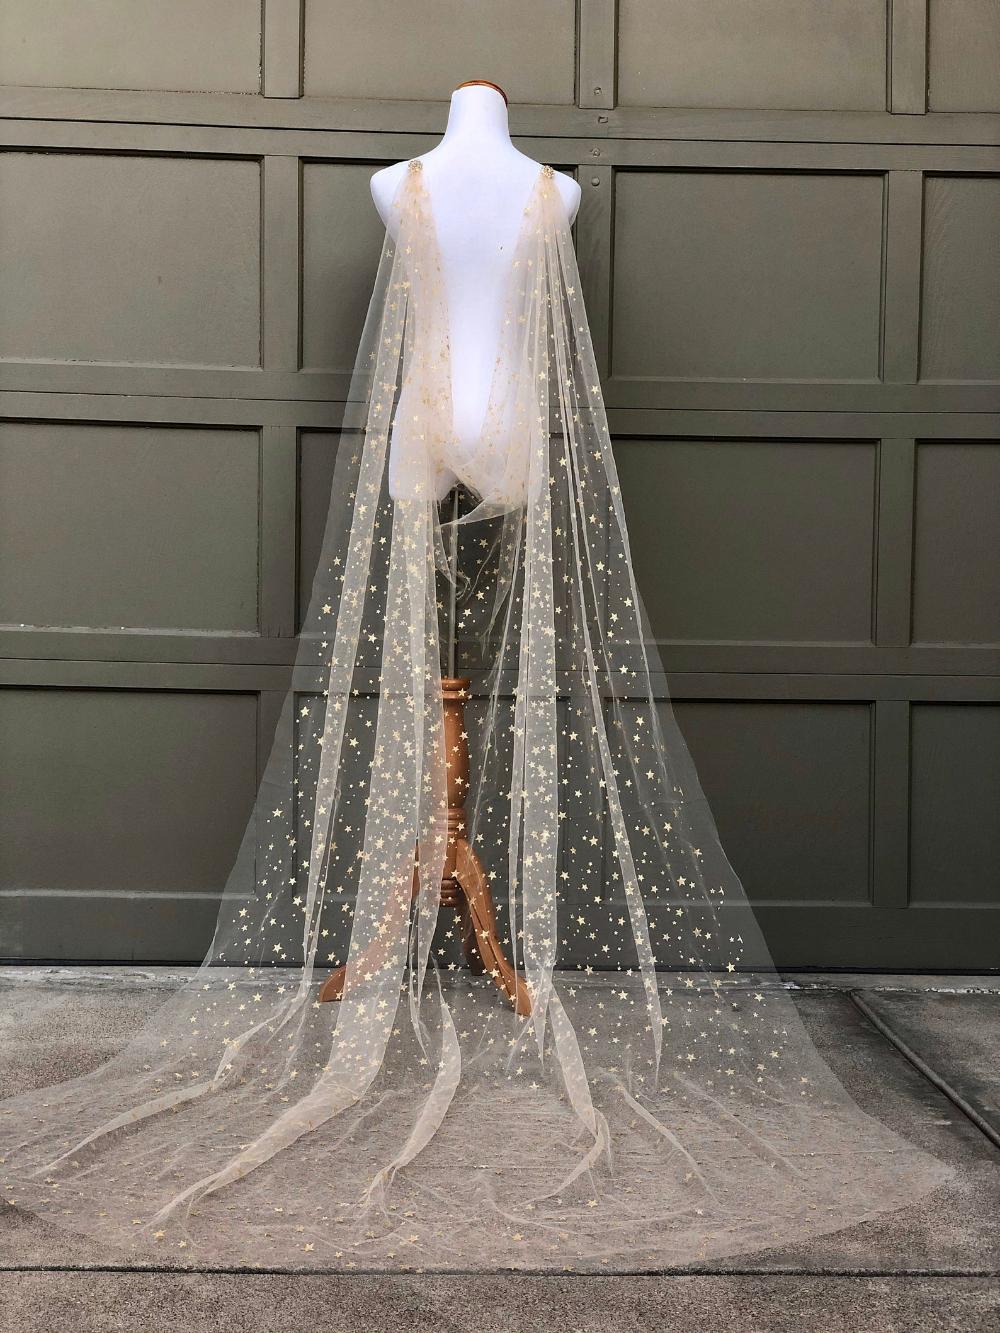 Gold Star Celestial Draped Wedding Cape Veil Bridal Cape With Etsy Wedding Dresses Wedding Cape Veil Bridal Cape